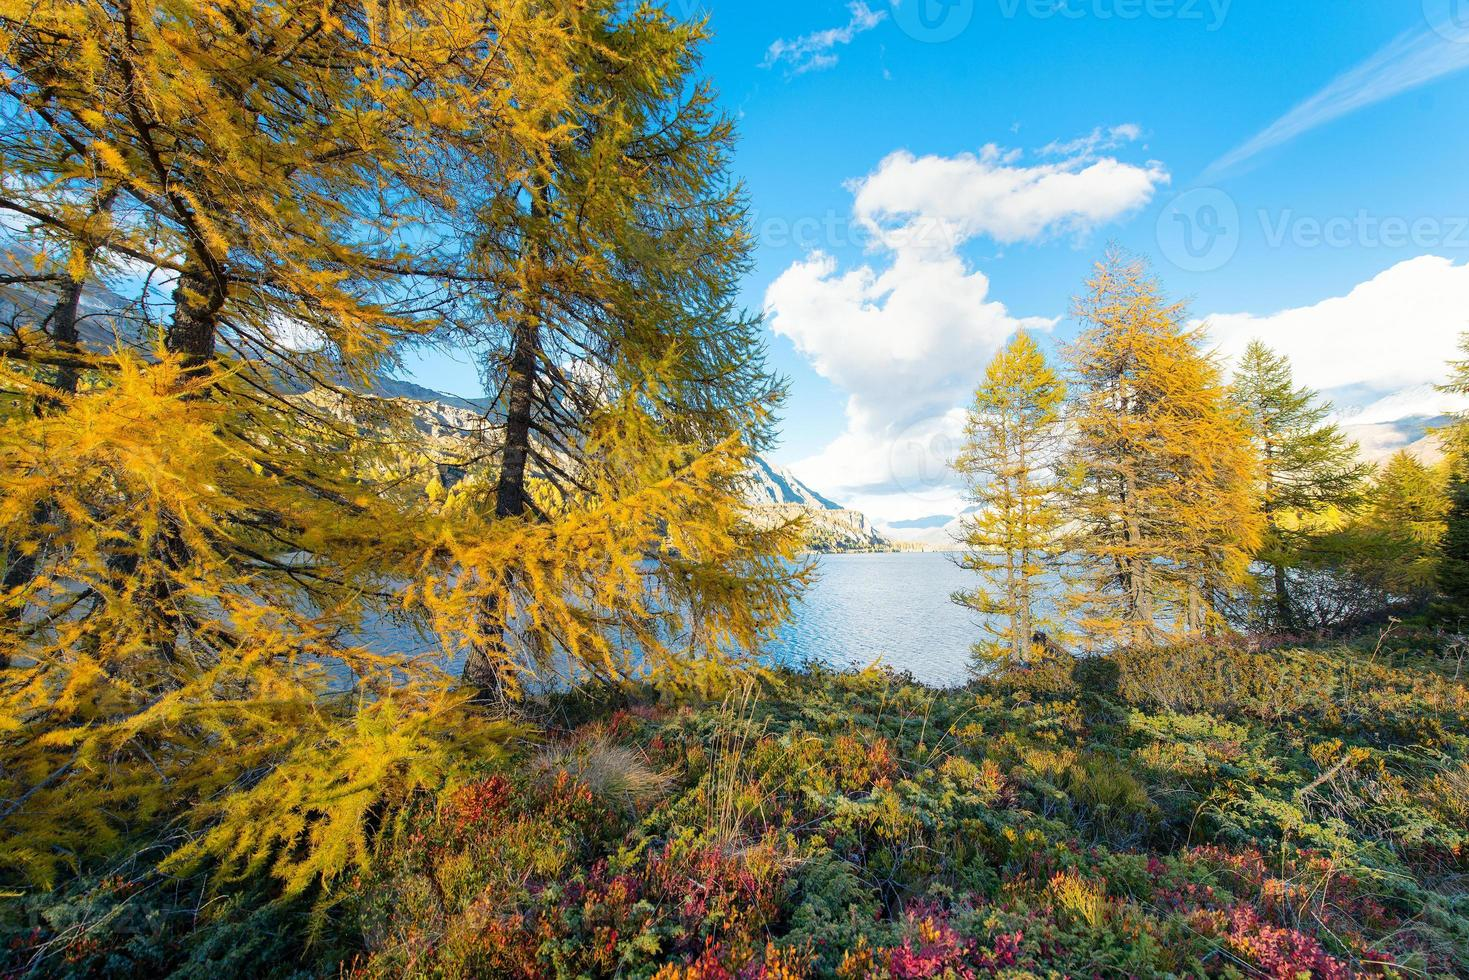 Autumn colors near an alpine lake photo